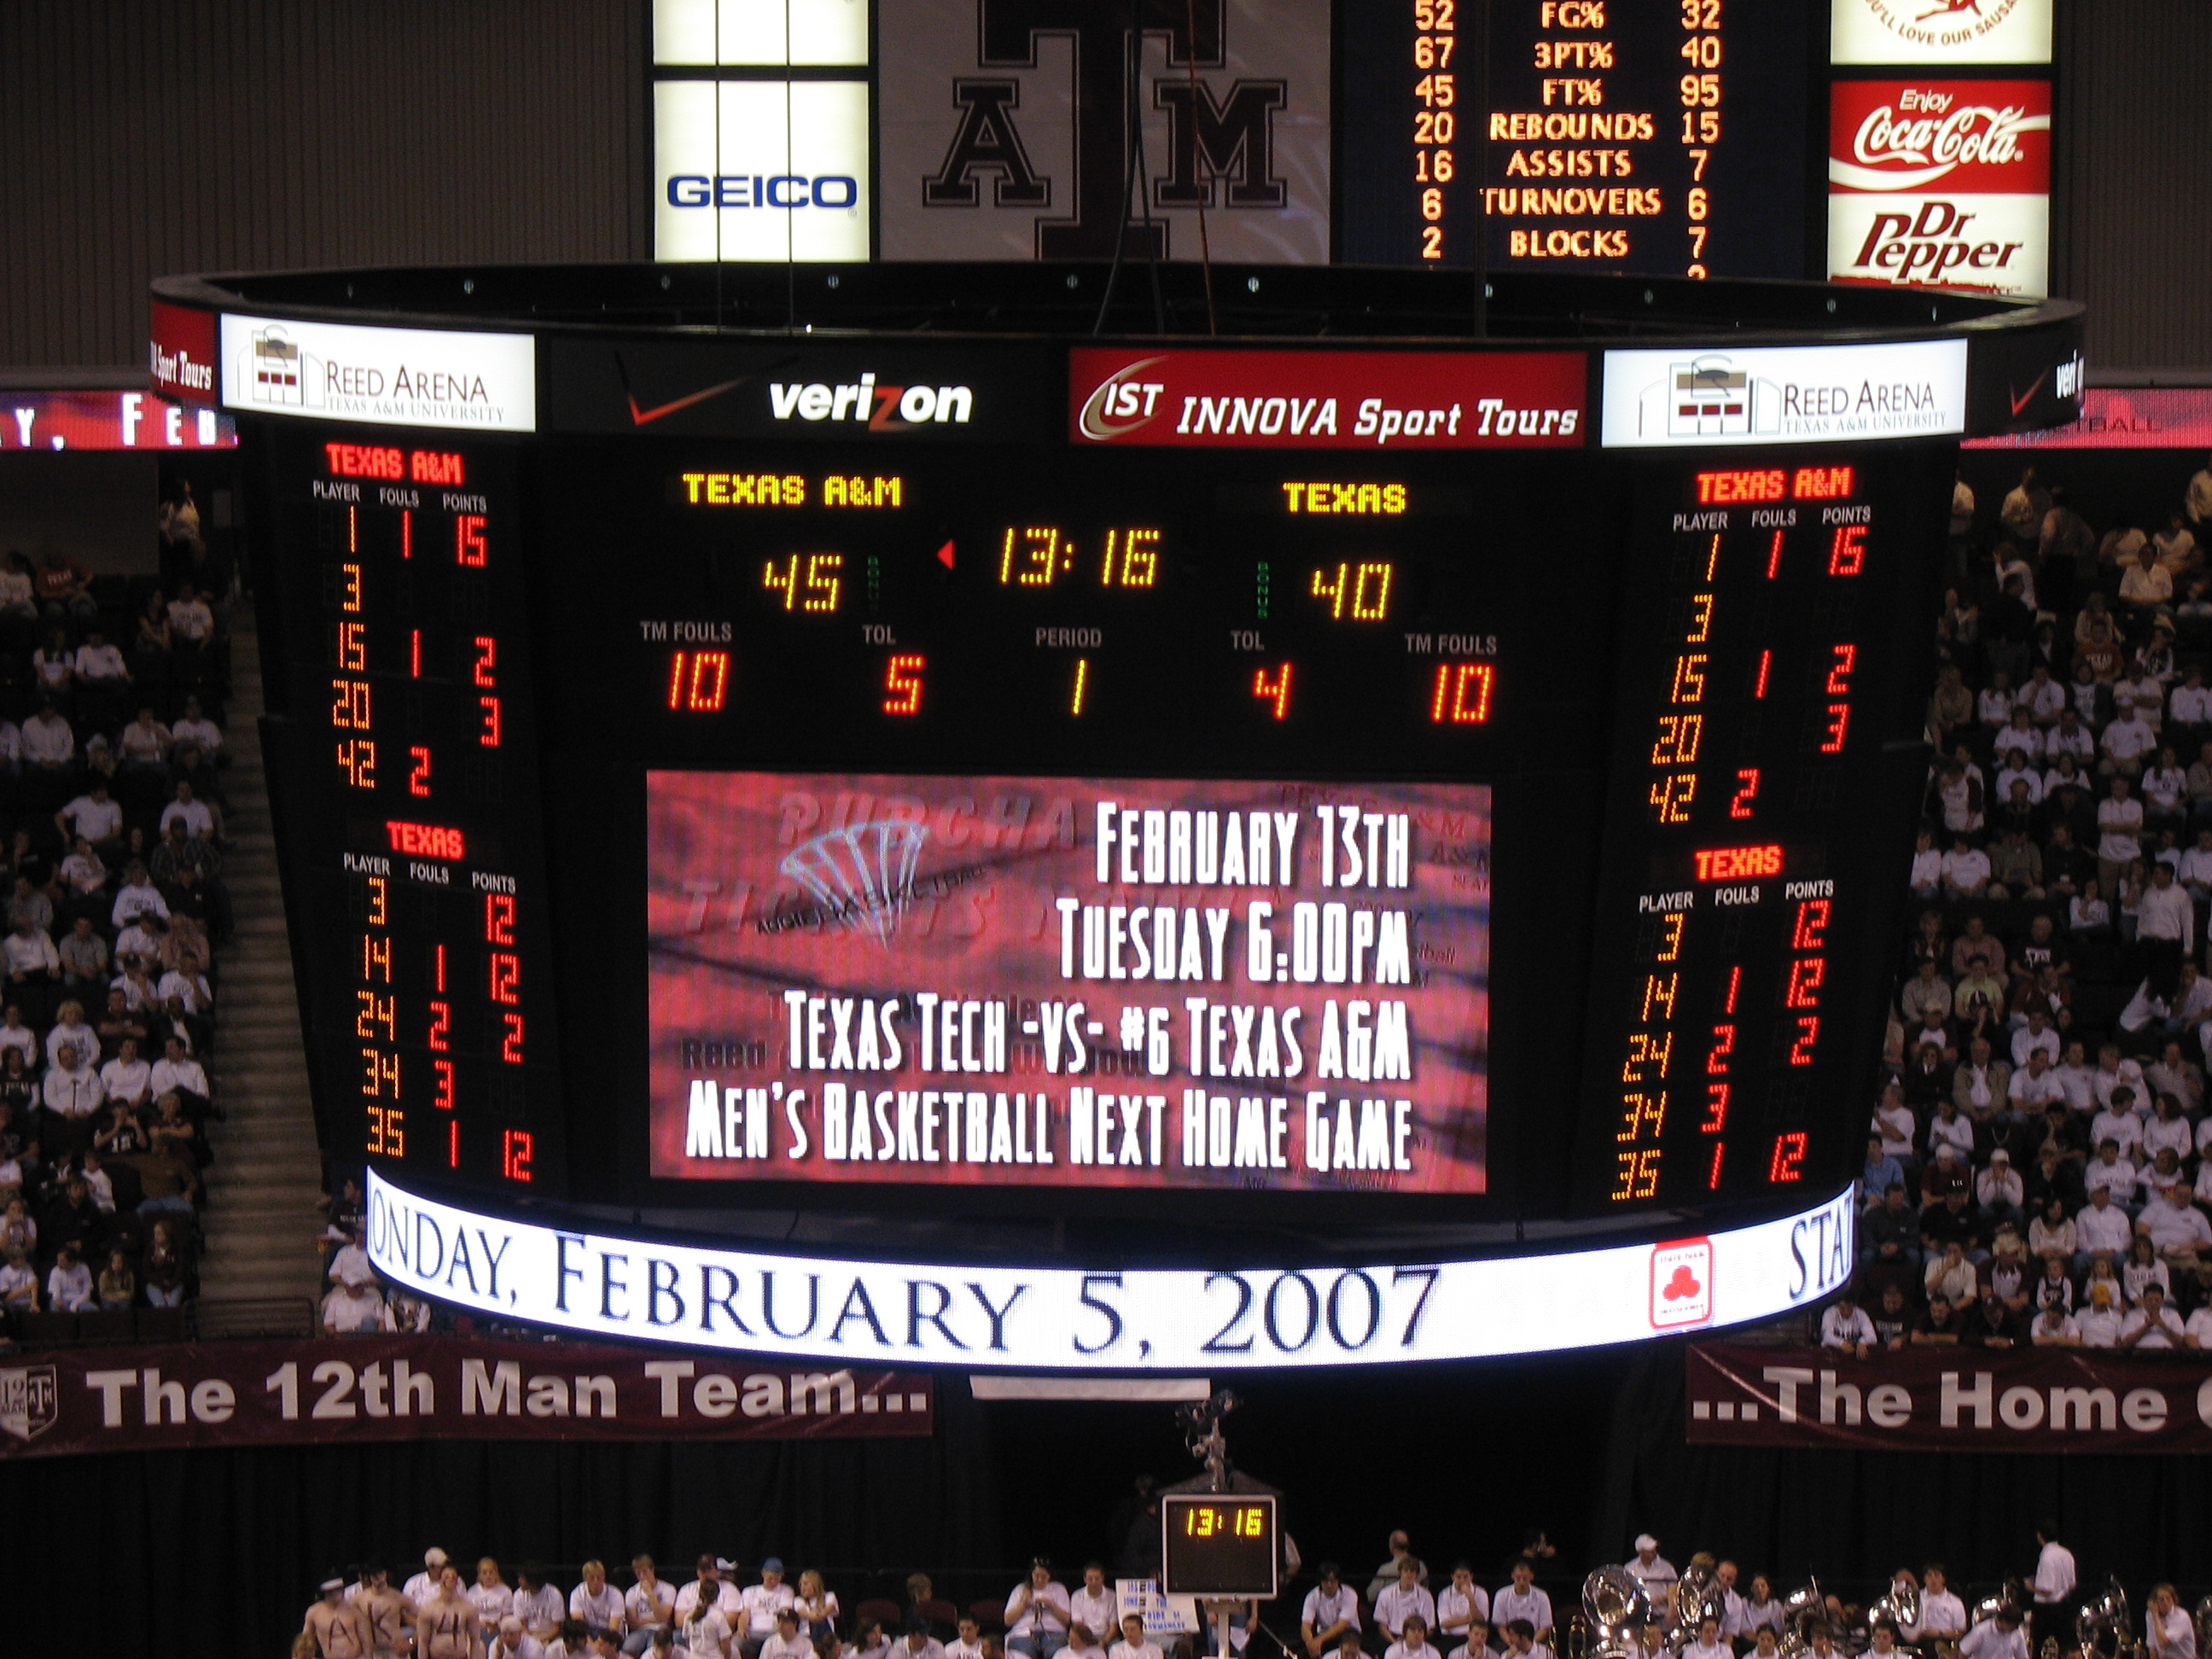 File:Reed arena scoreboard.jpg - Wikimedia Commons